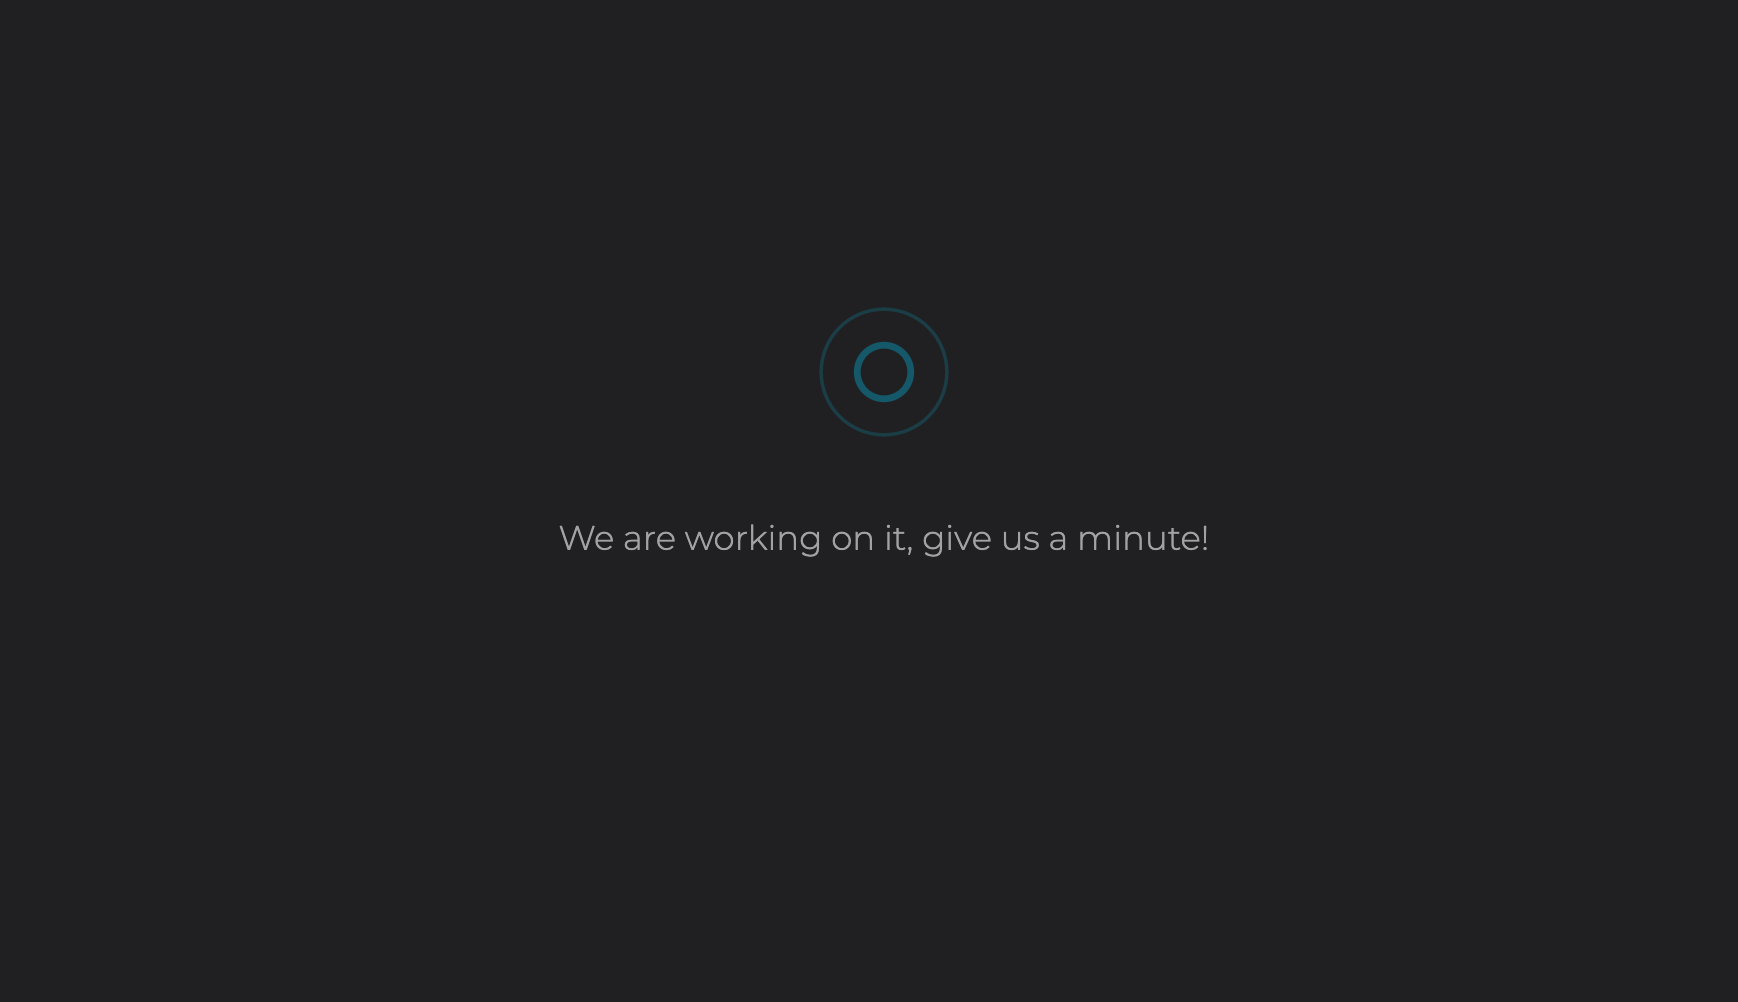 Reduce video size on Mac